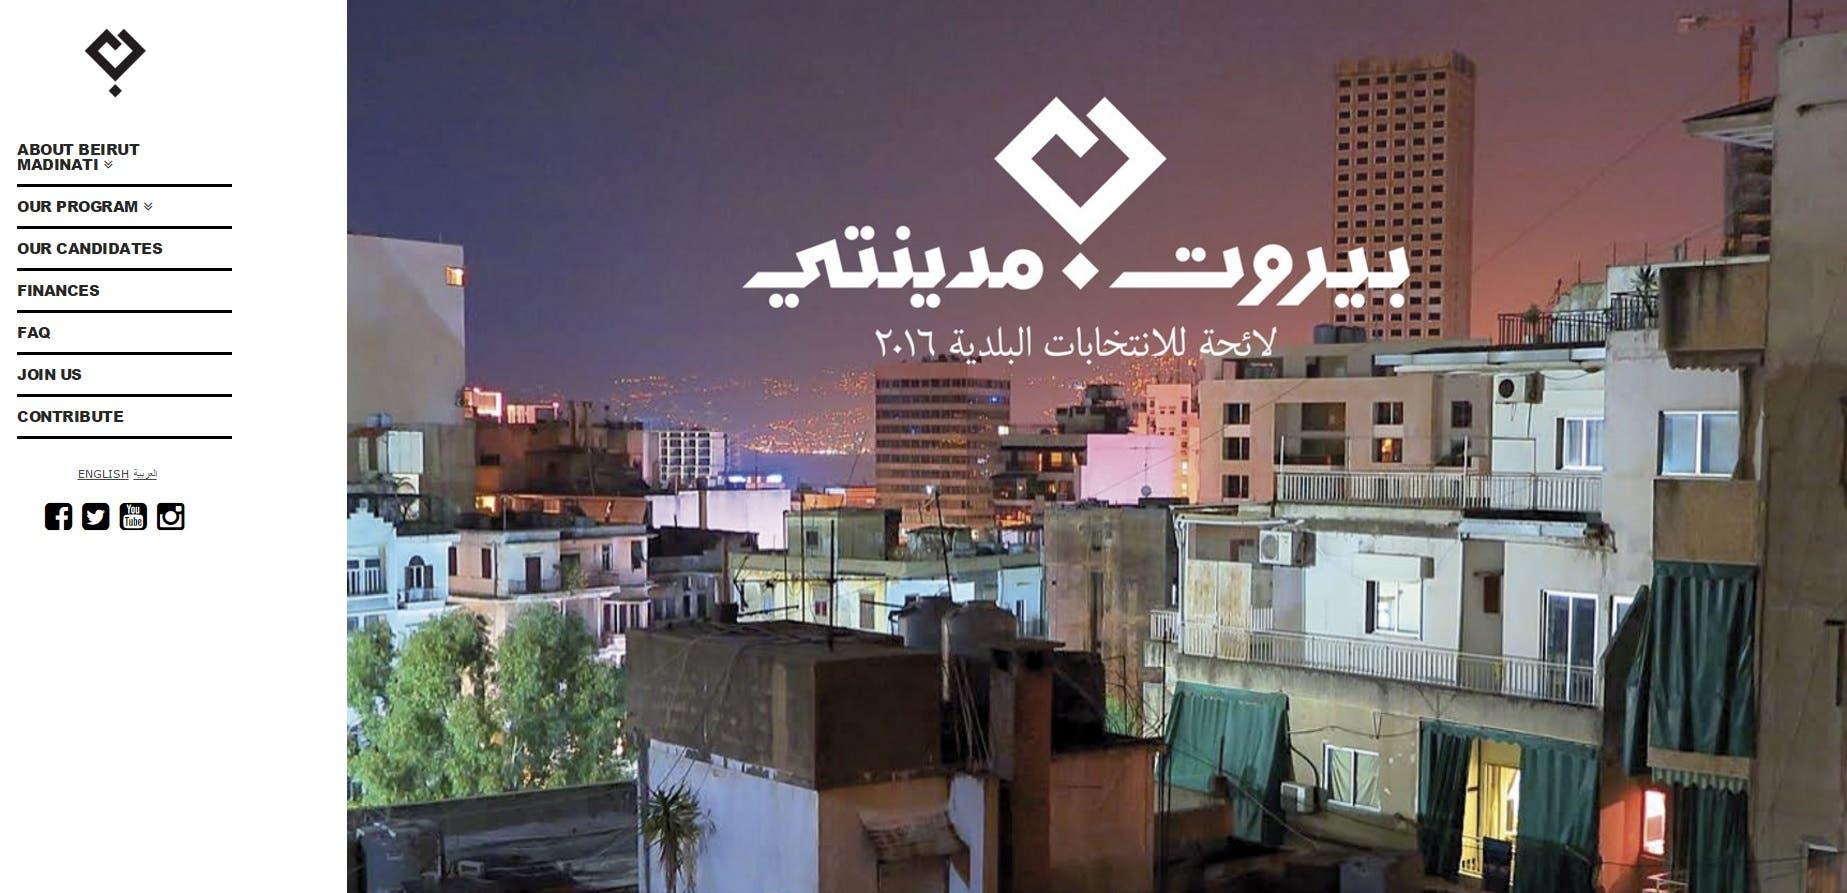 Beirut Madinati (Screengrab from Beirut Madinati)